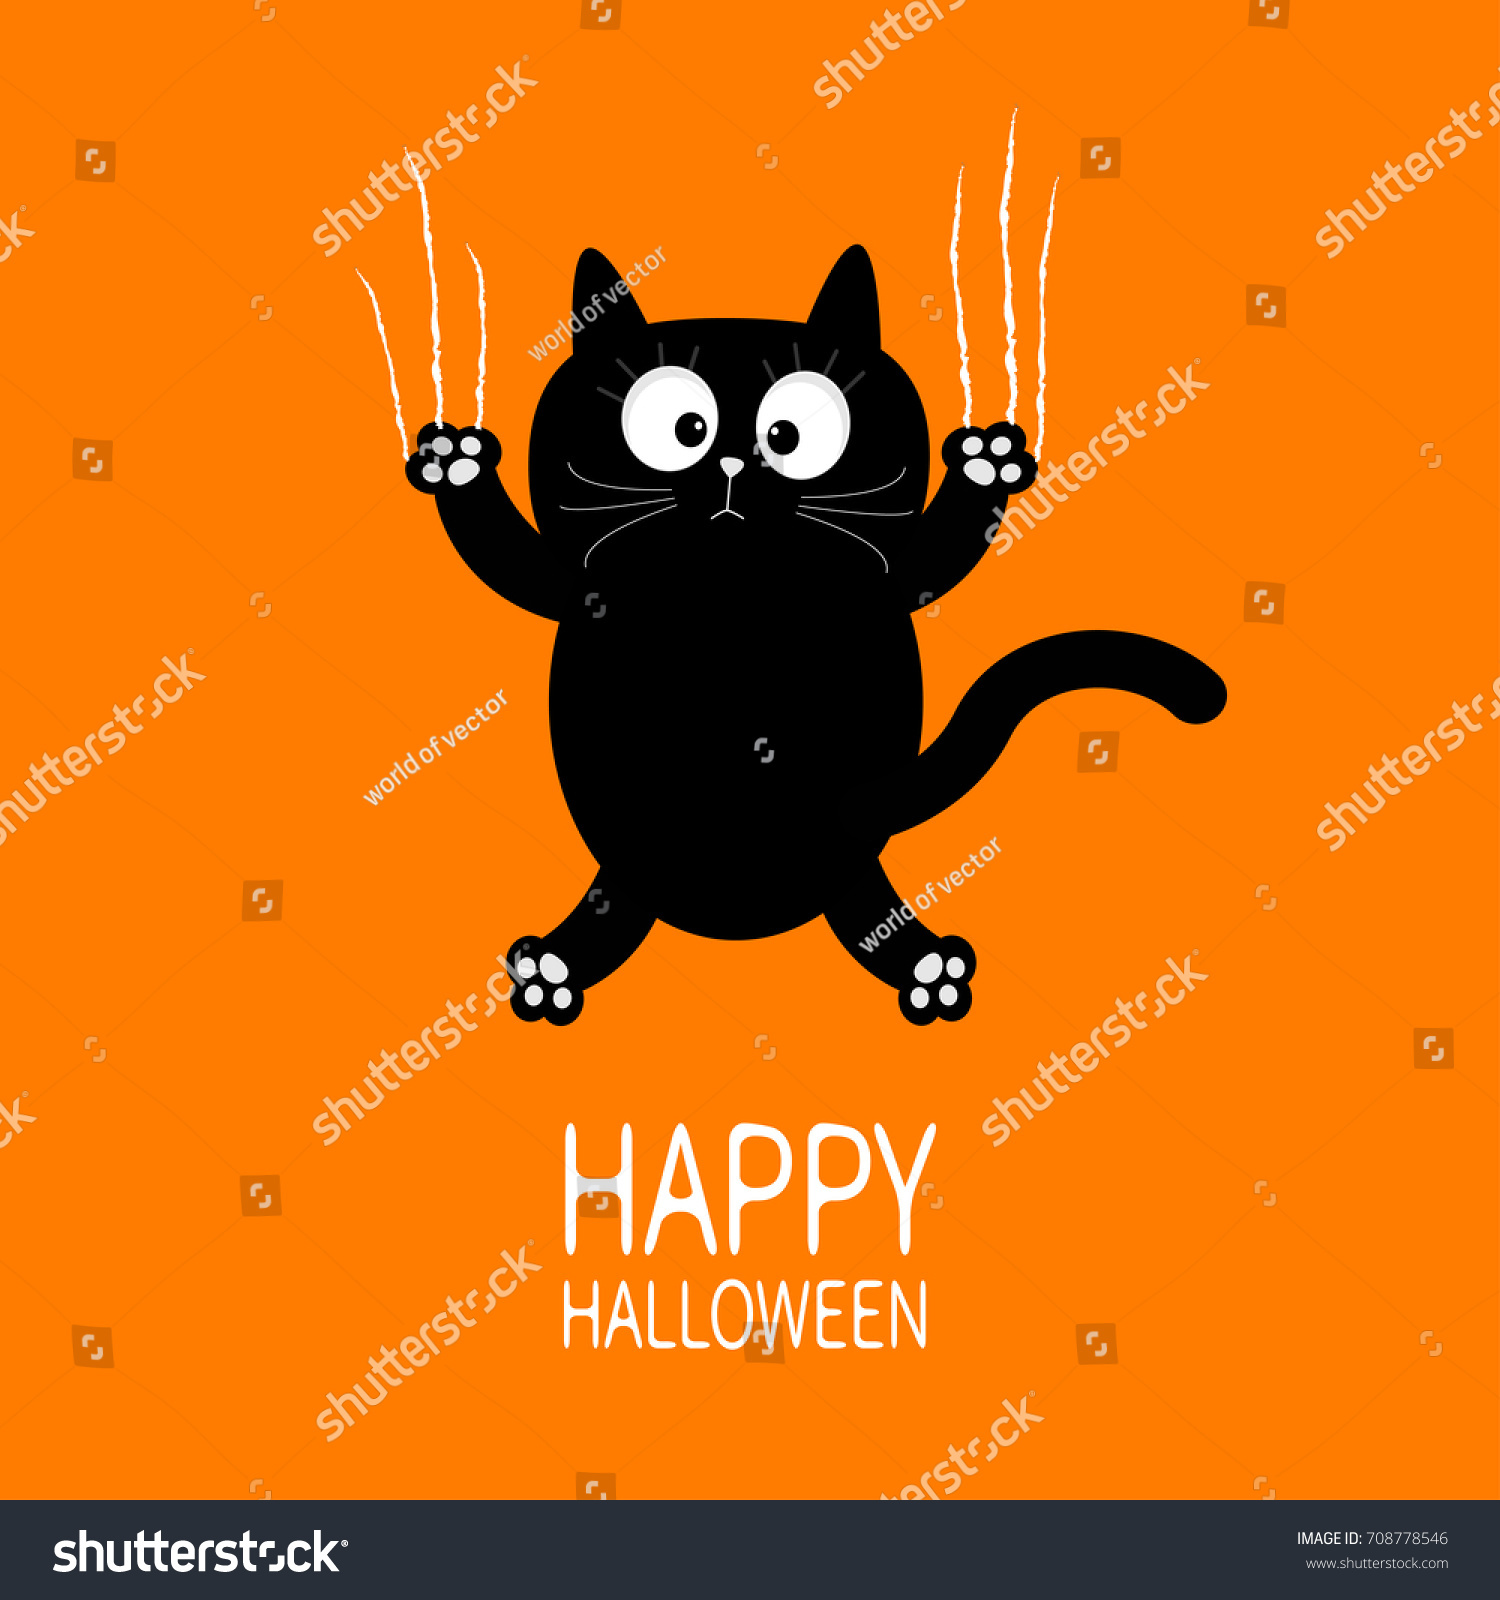 Happy Halloween Black Cat Claw Scratch Stock Illustration